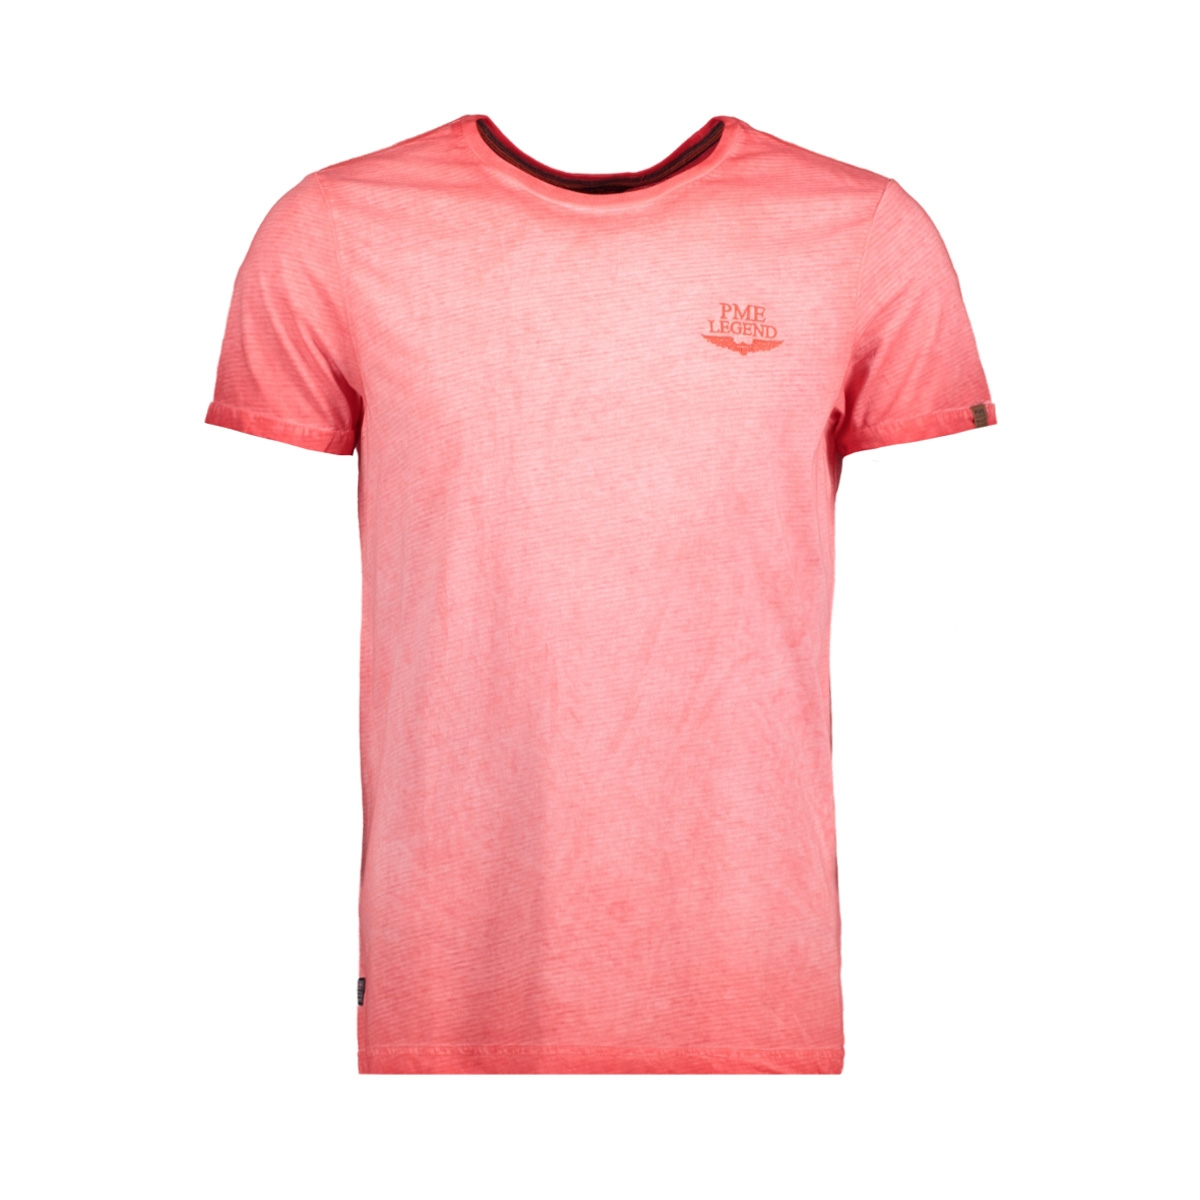 ptss178531 pme legend t-shirt 3260